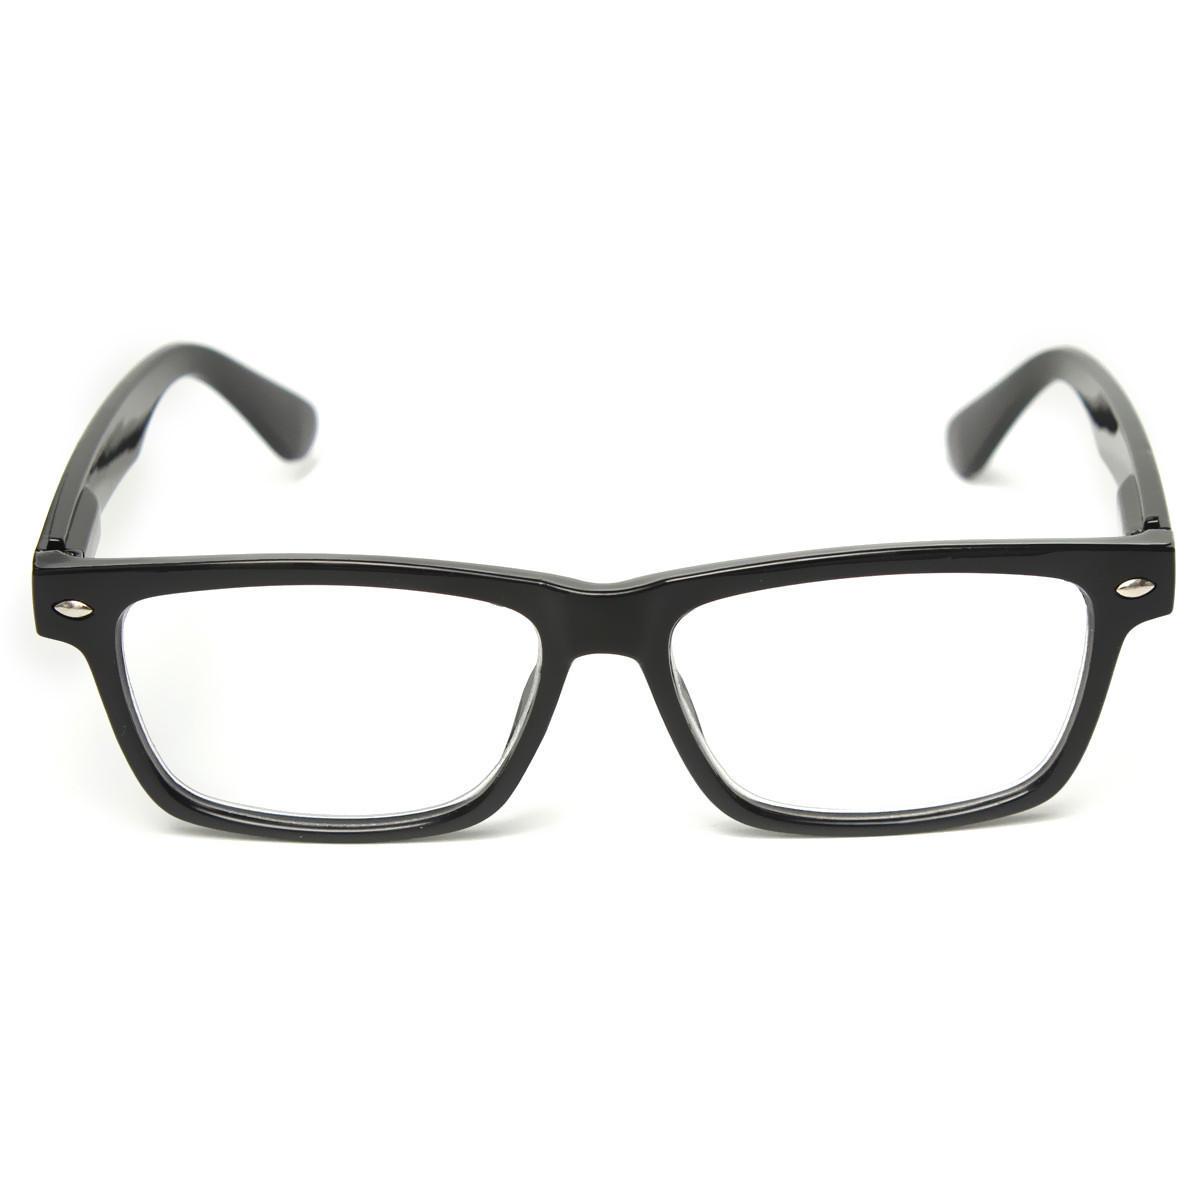 Kacamata Baca Hitam Nyaman Presbyopic Border Strength 1.0 1.5 2.0 2.5 3.0 3.5 4.0